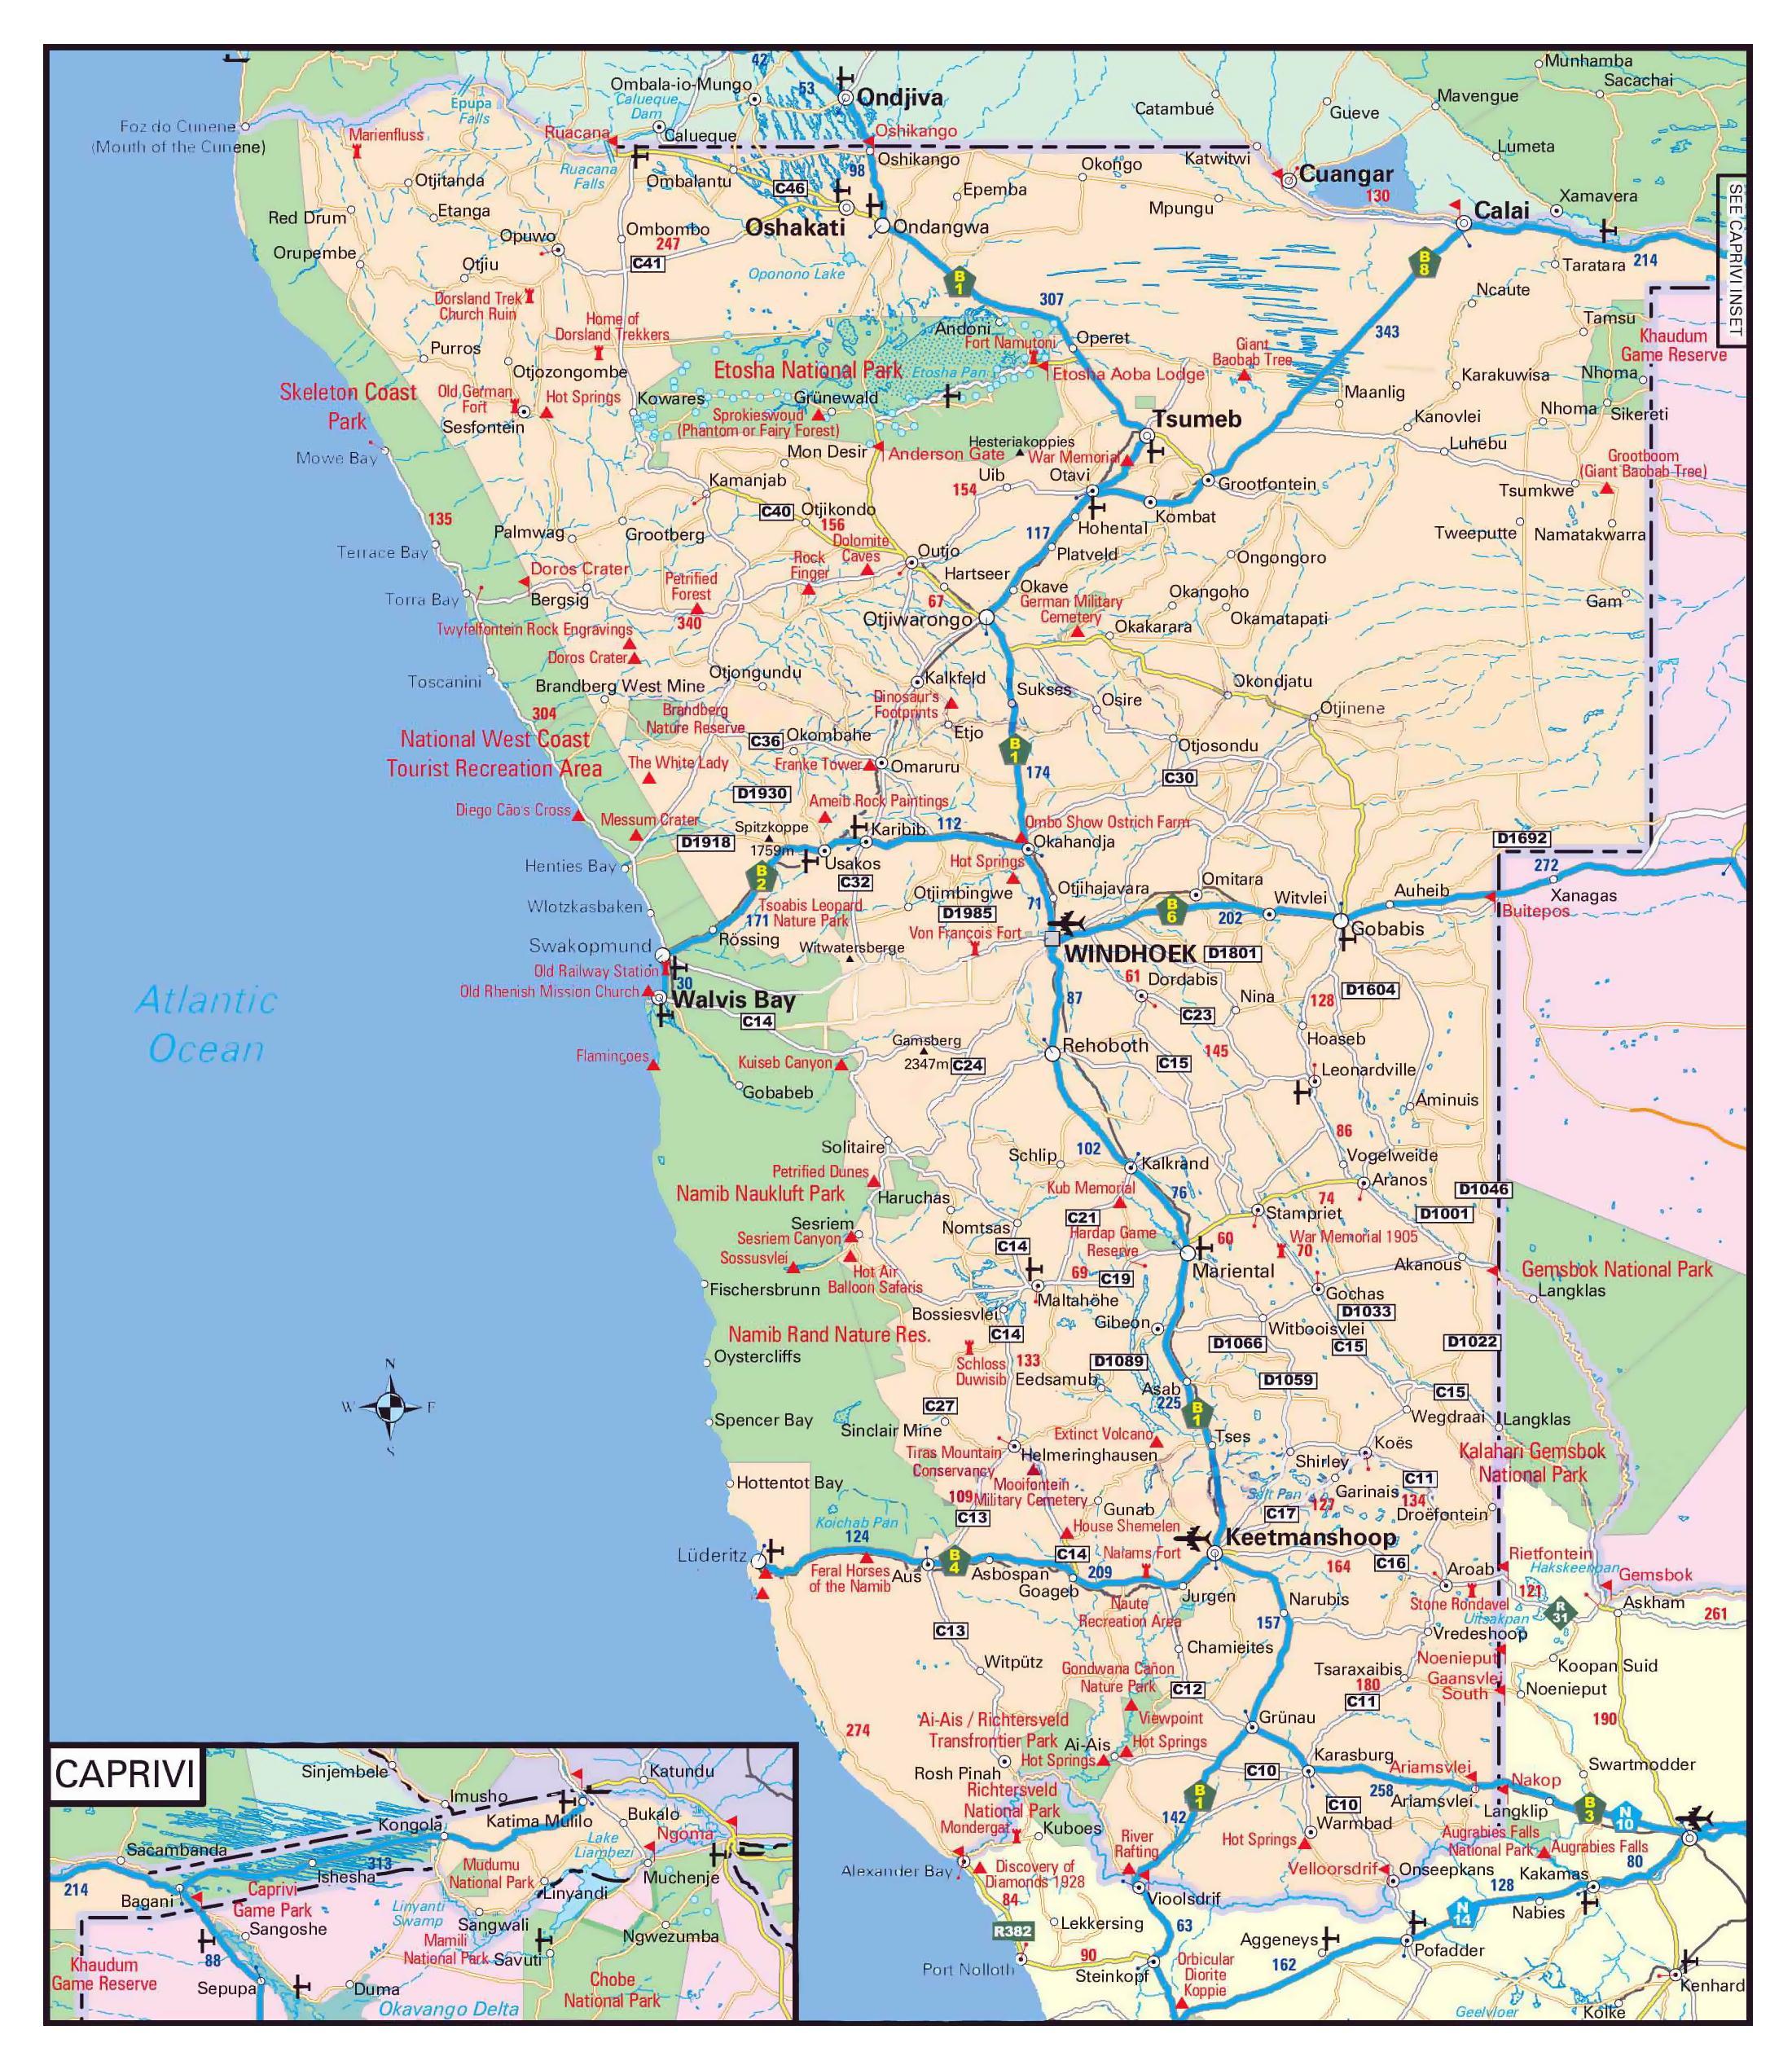 Namibian Road Map Namibian Tiet Kartta Etela Afrikka Afrikka